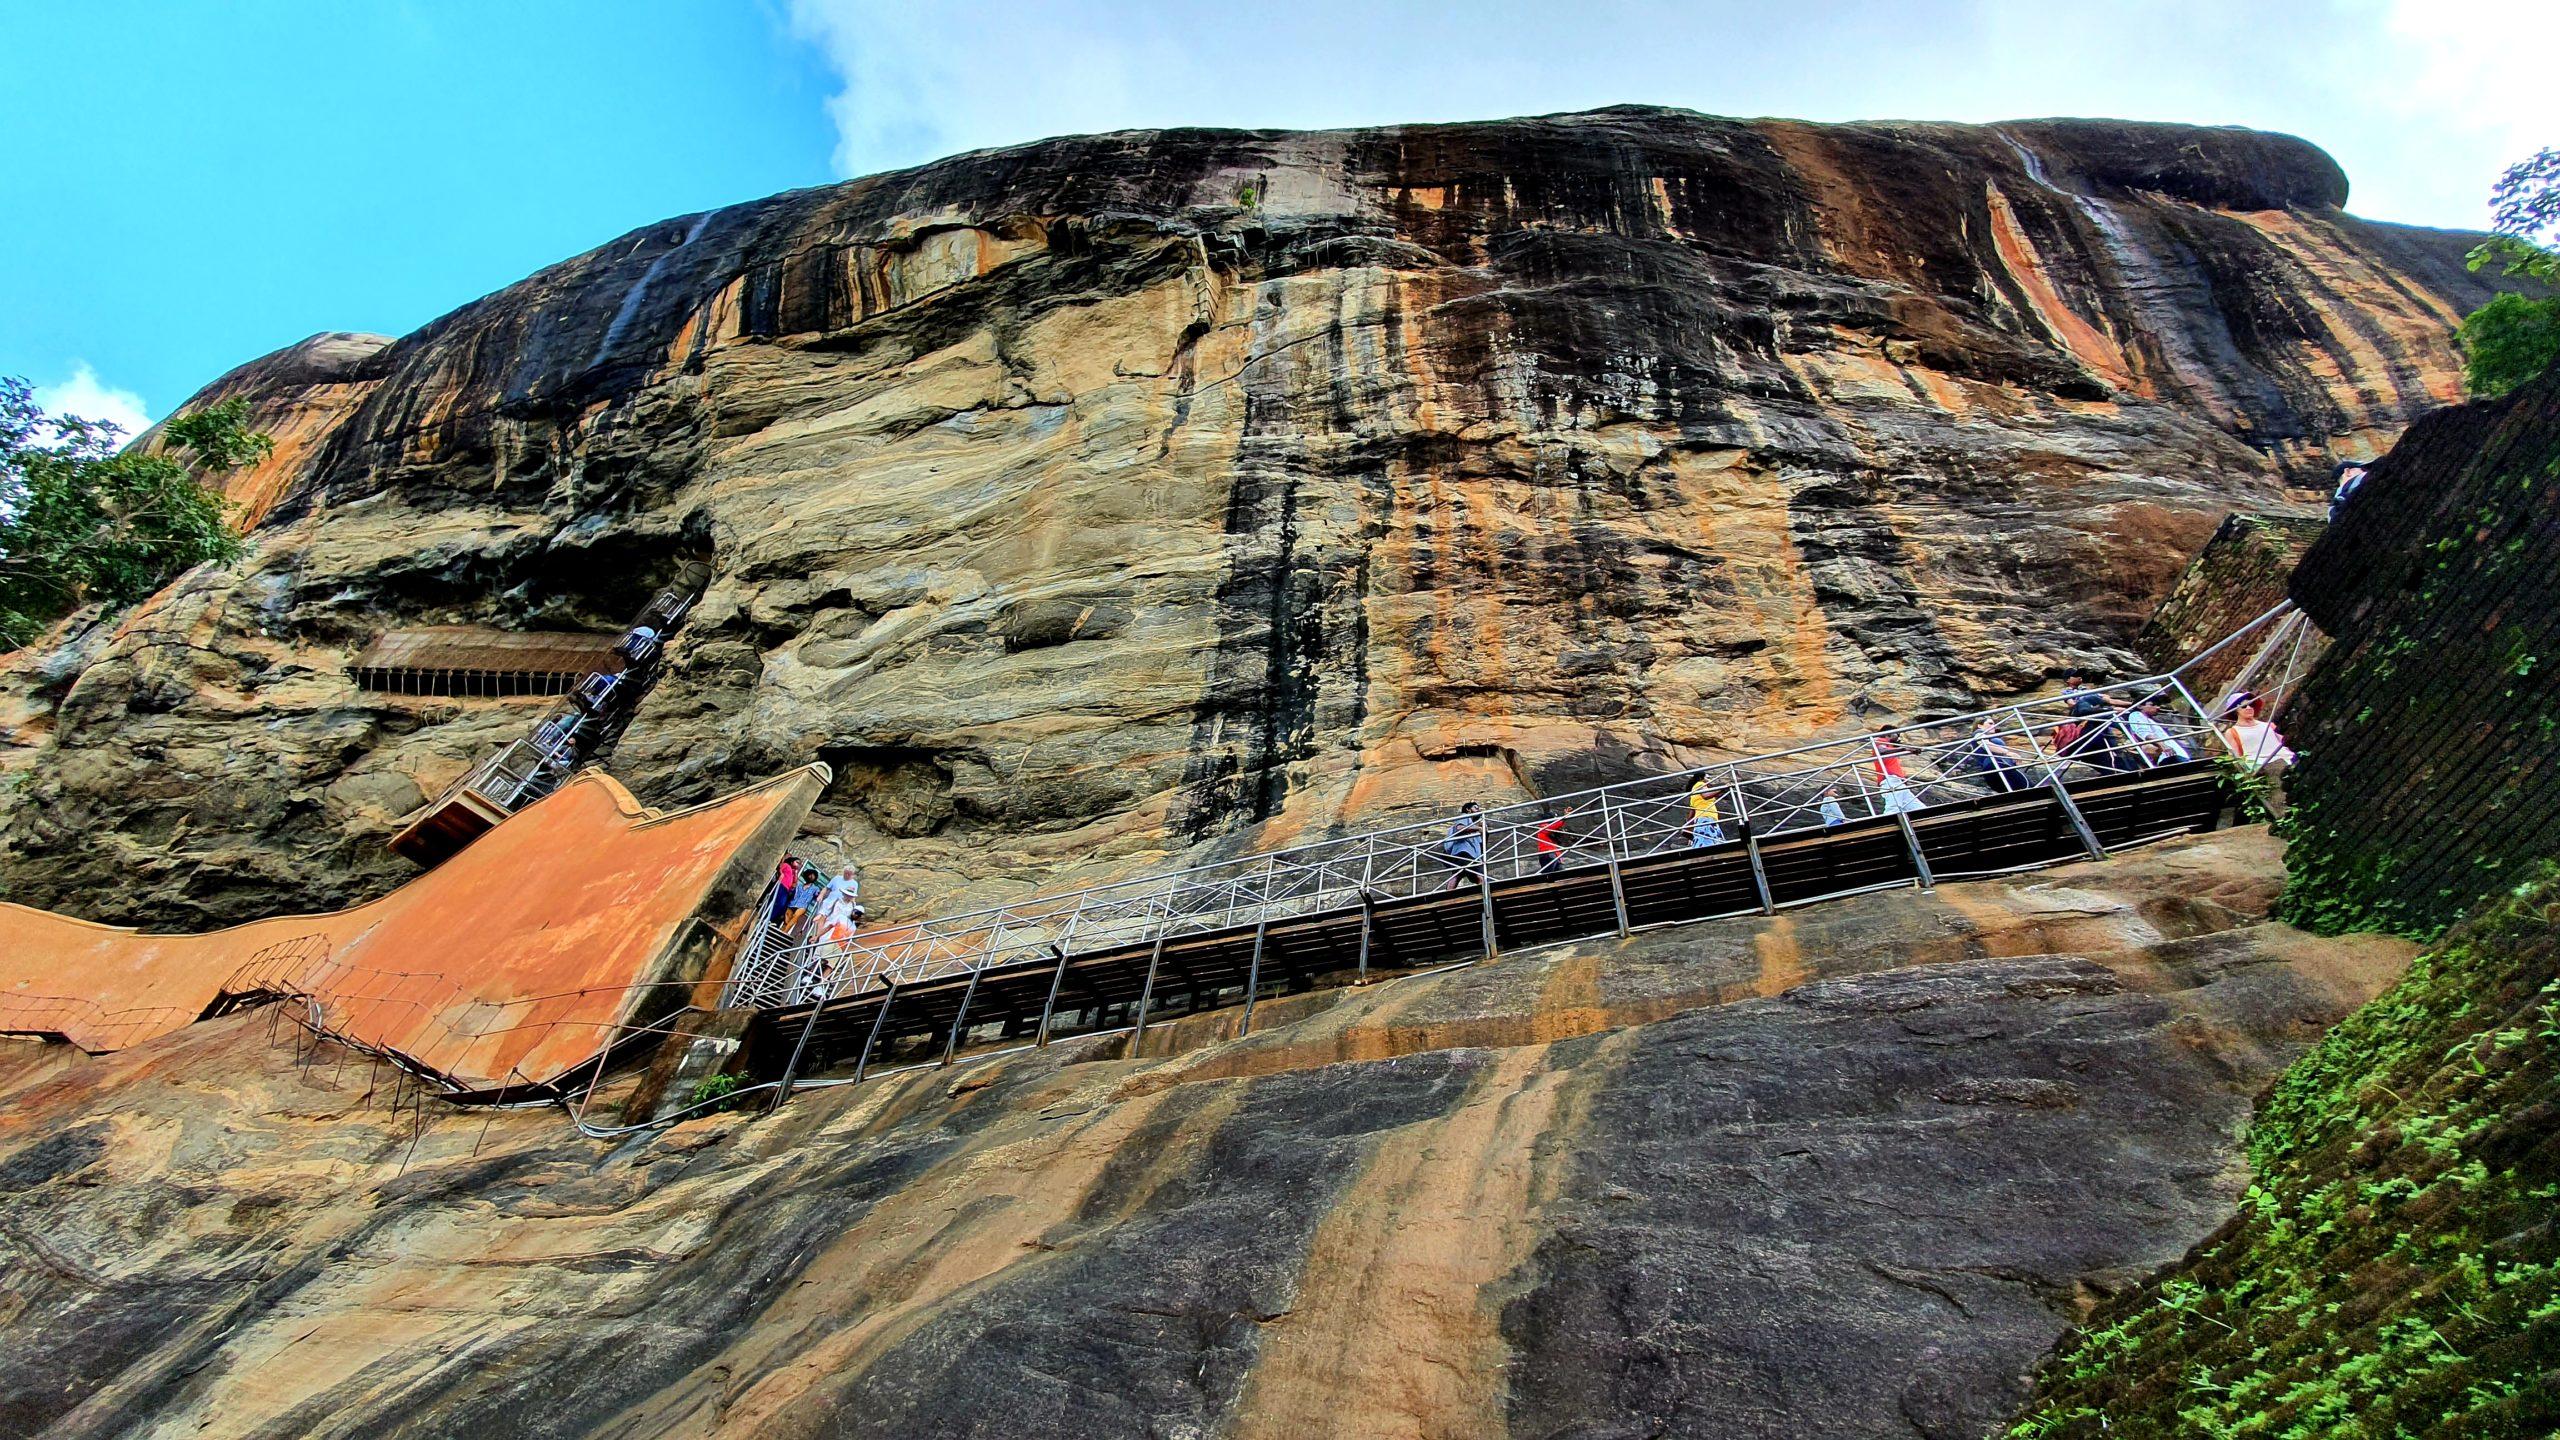 Sigiriya is one of the top things to do in Sri Lanka